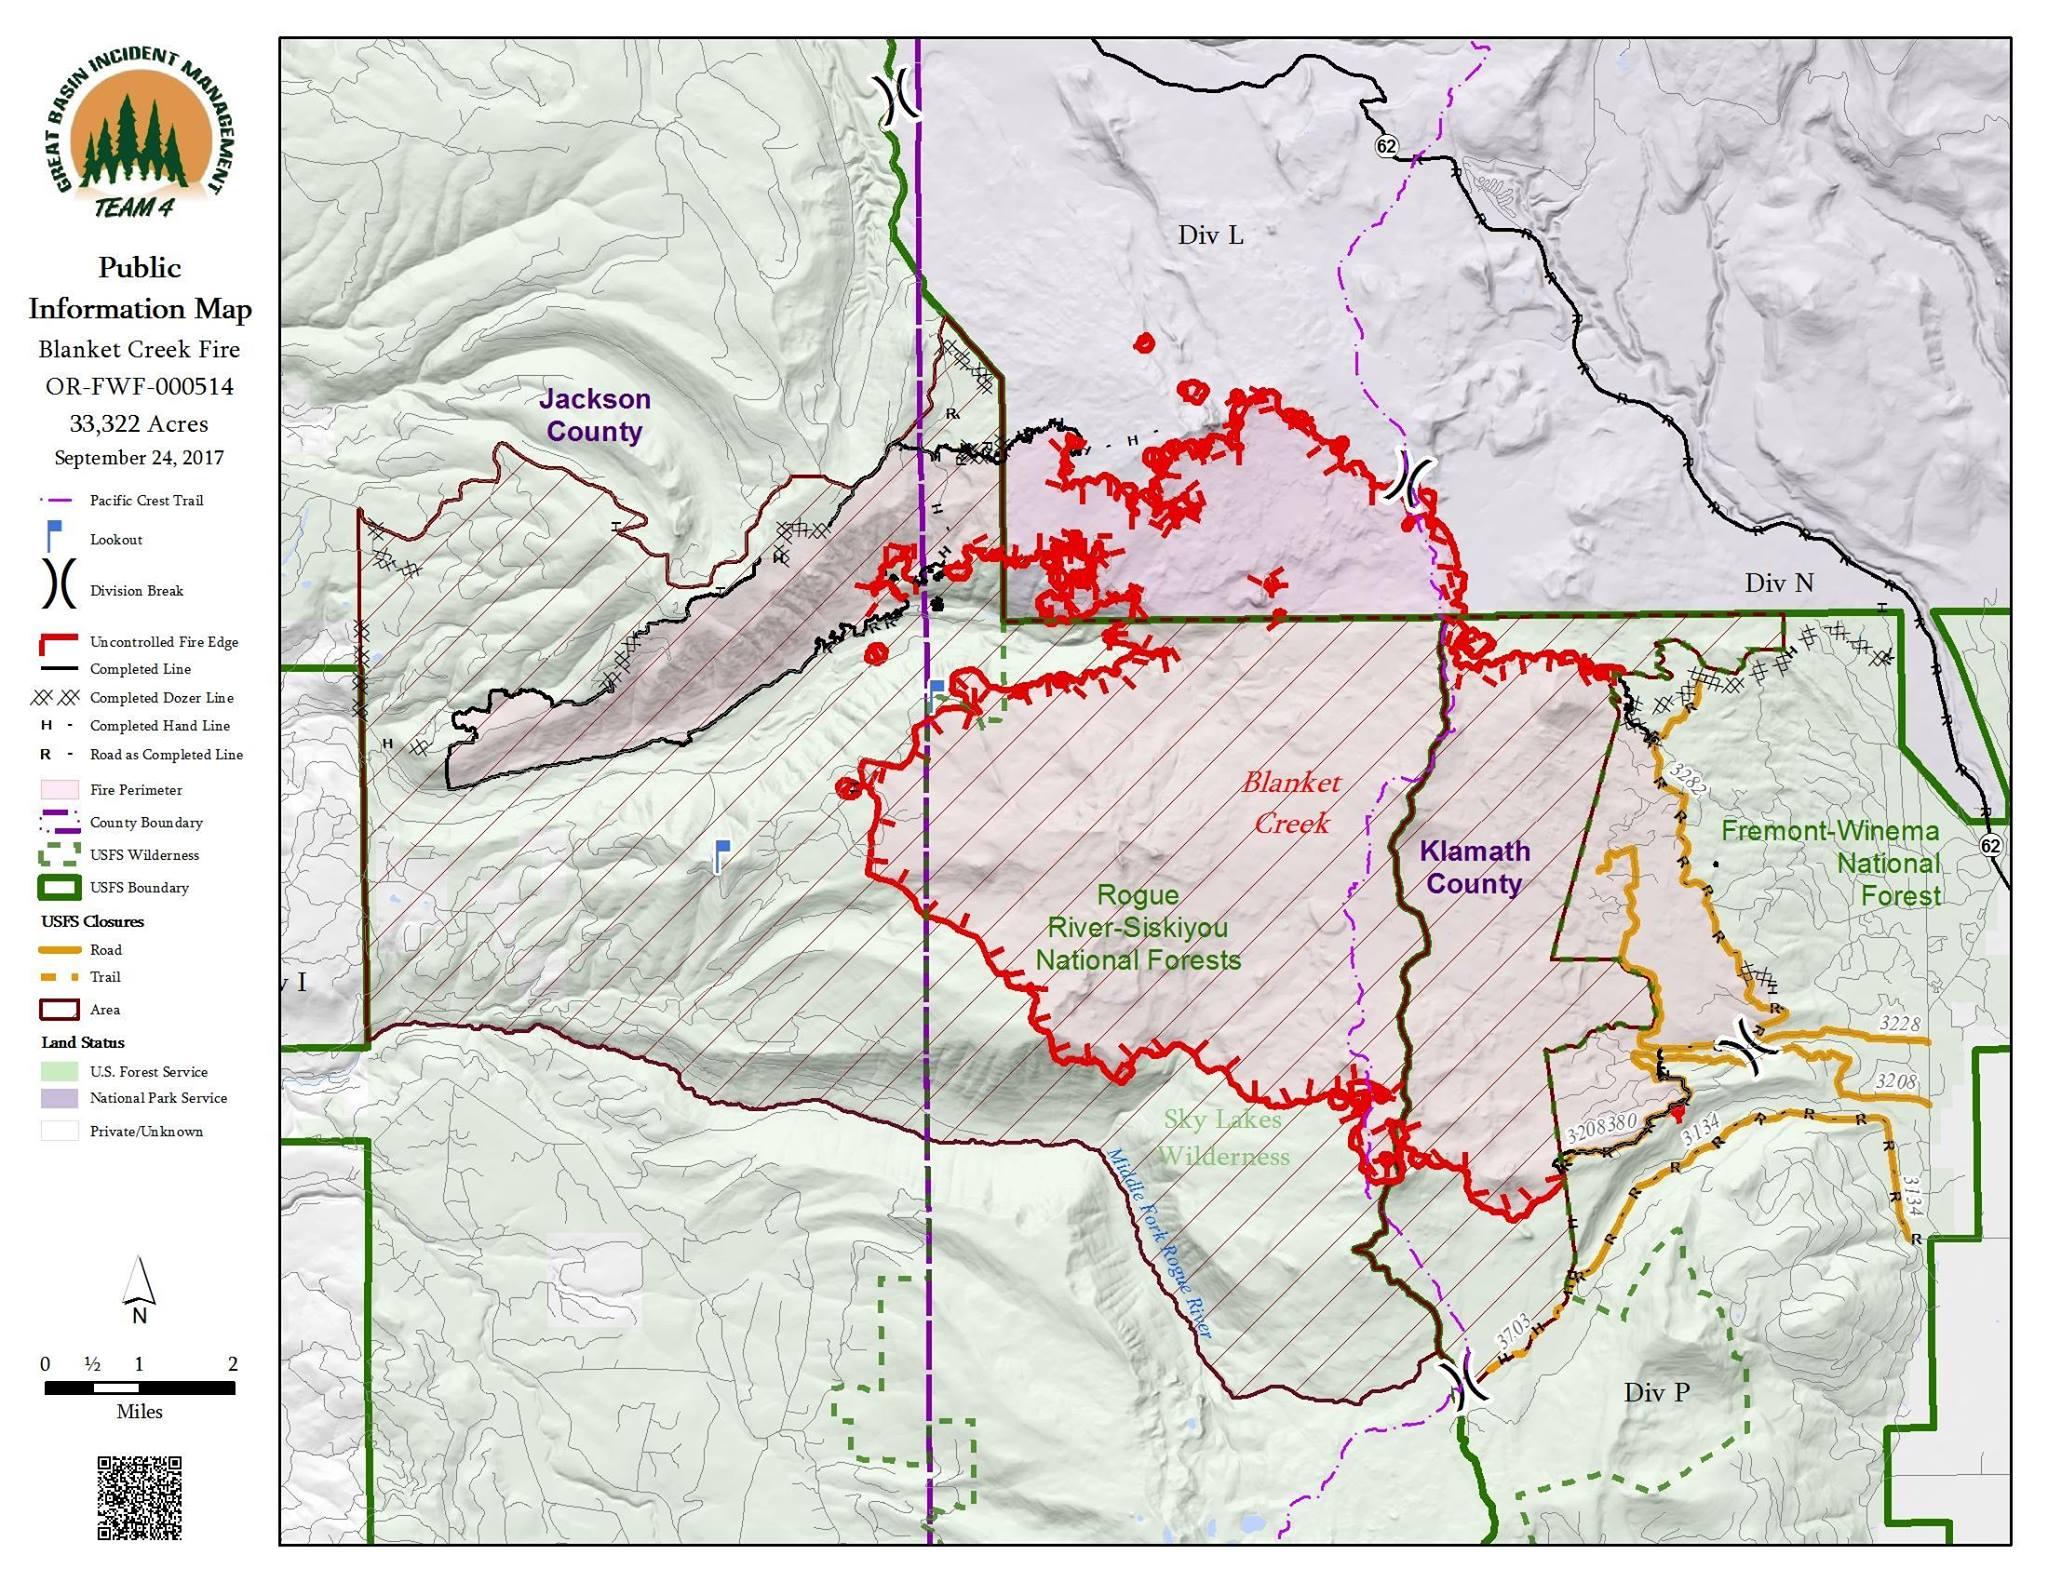 PIO Map Blanket Creek Fire (Inciweb)